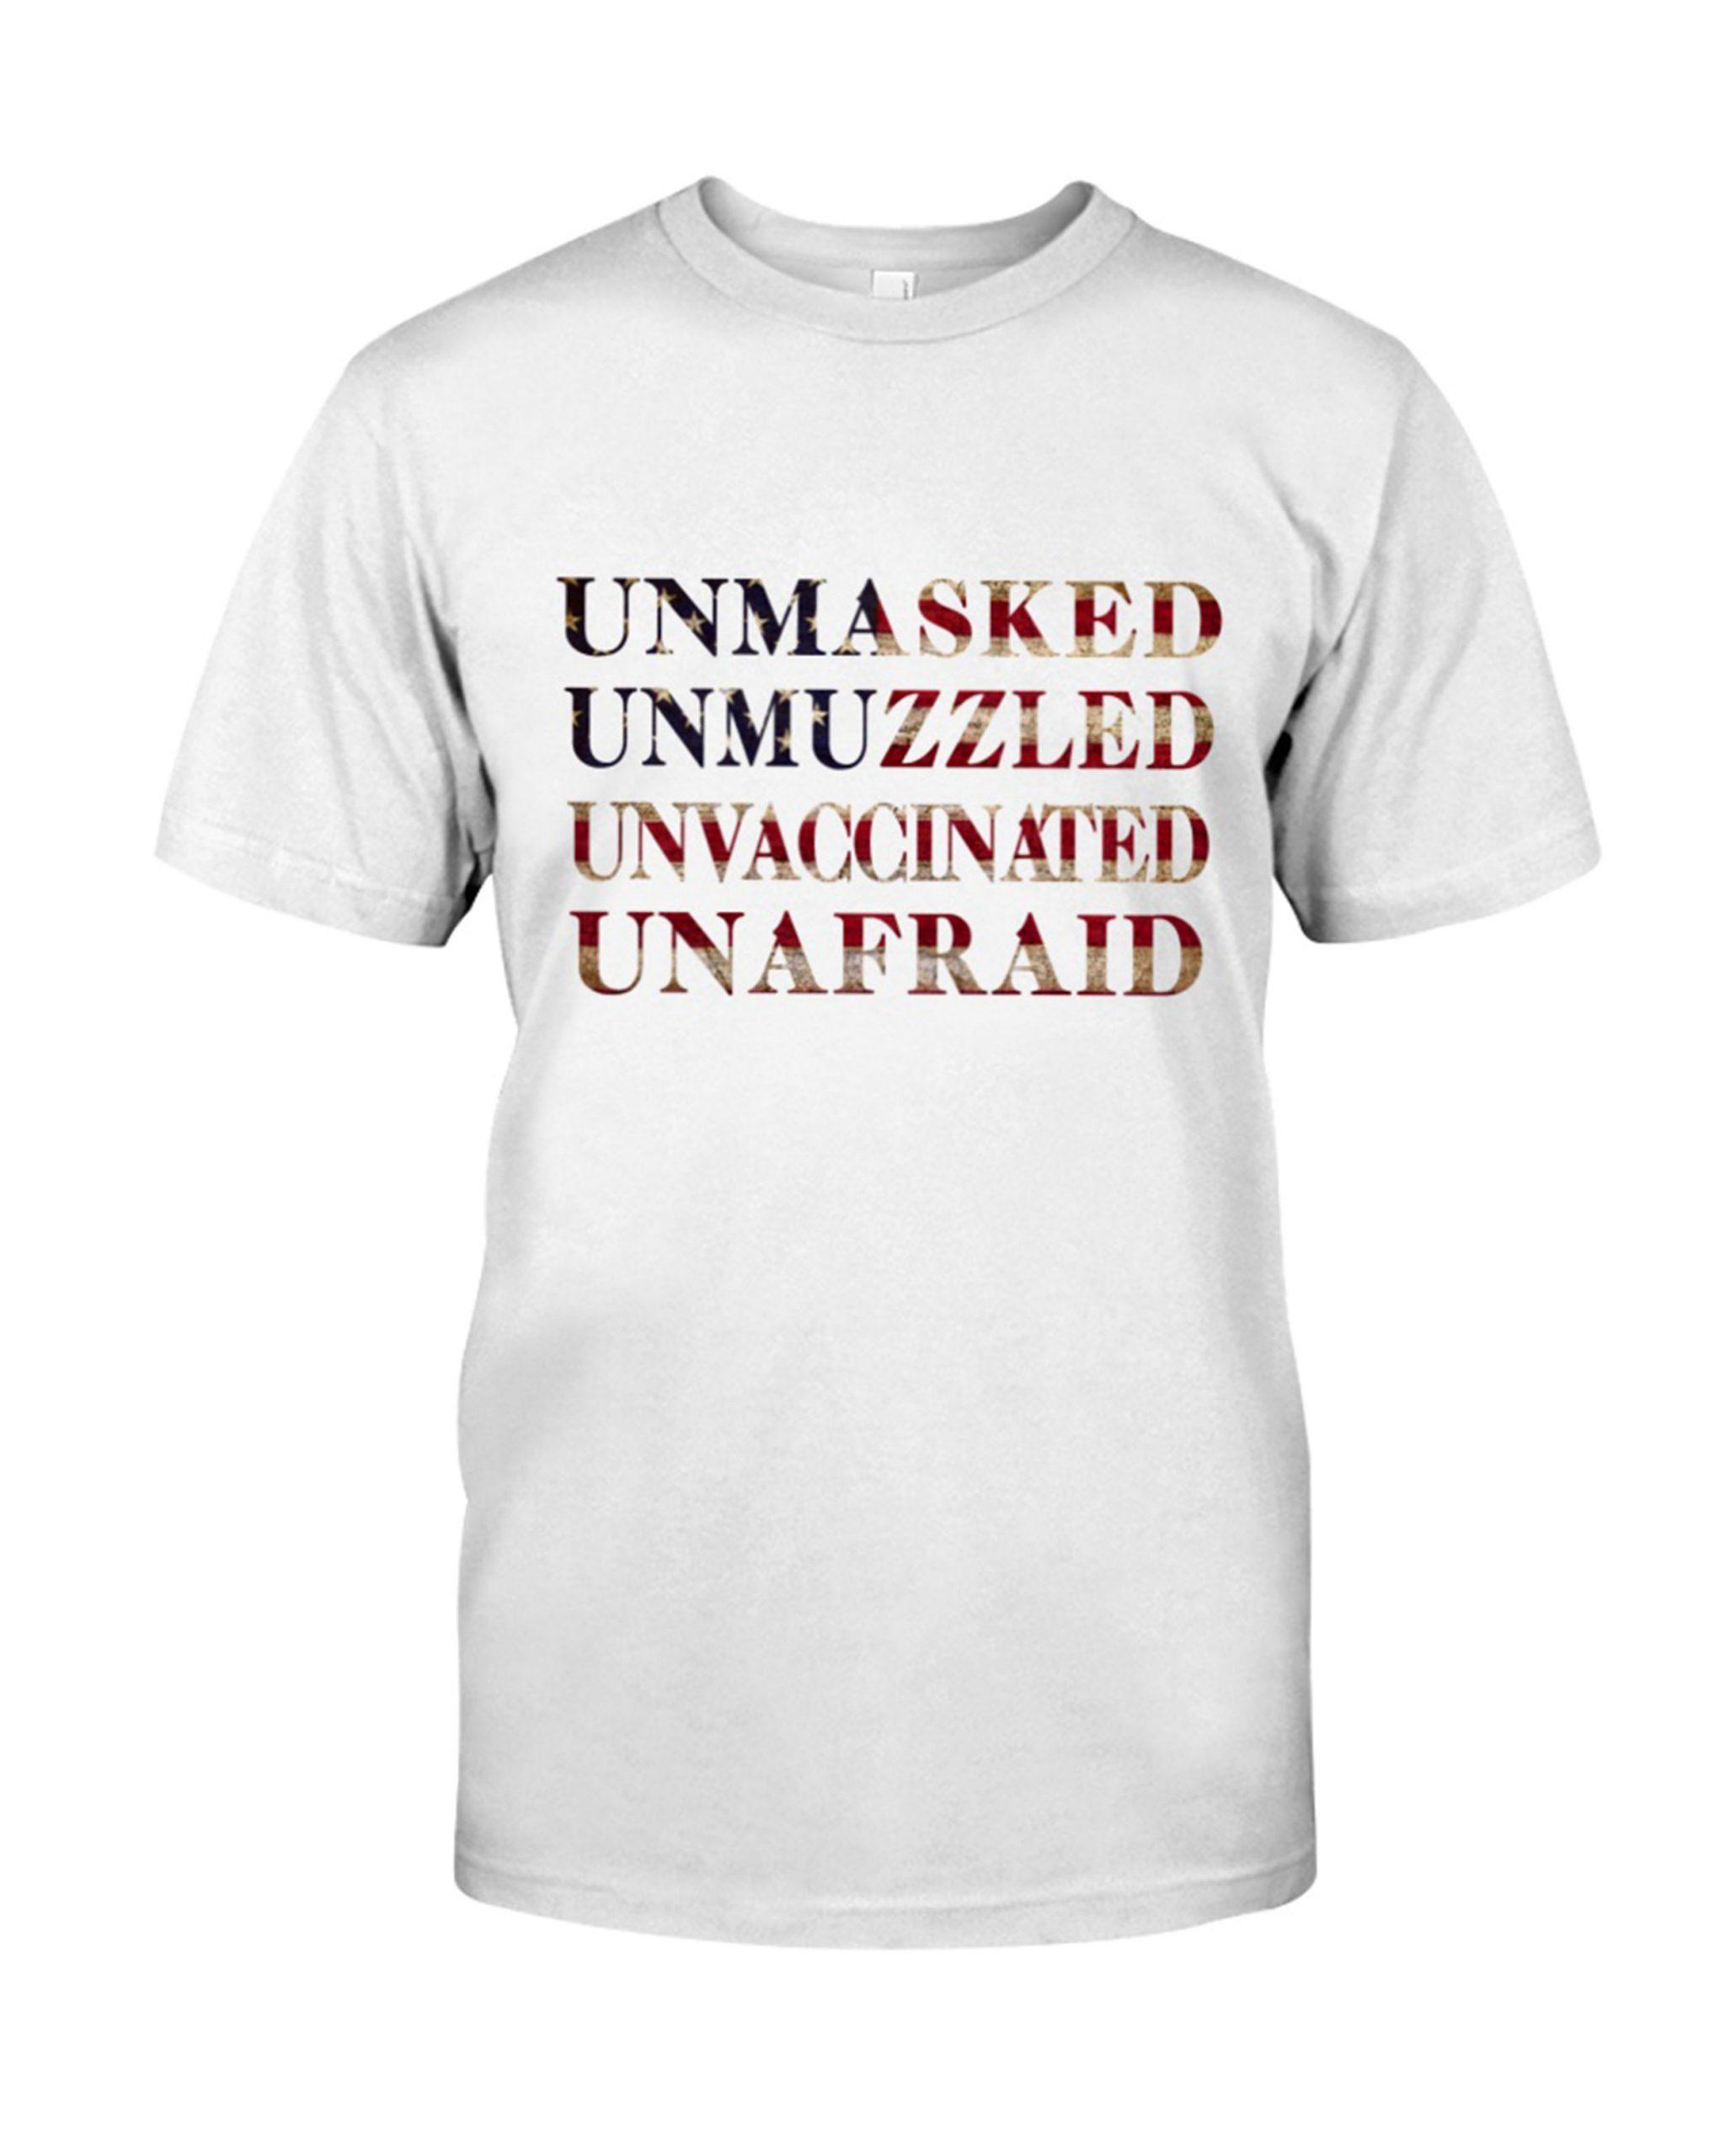 Unmasked Unmuzzled Unvaccinated Unafraid Shirt 4